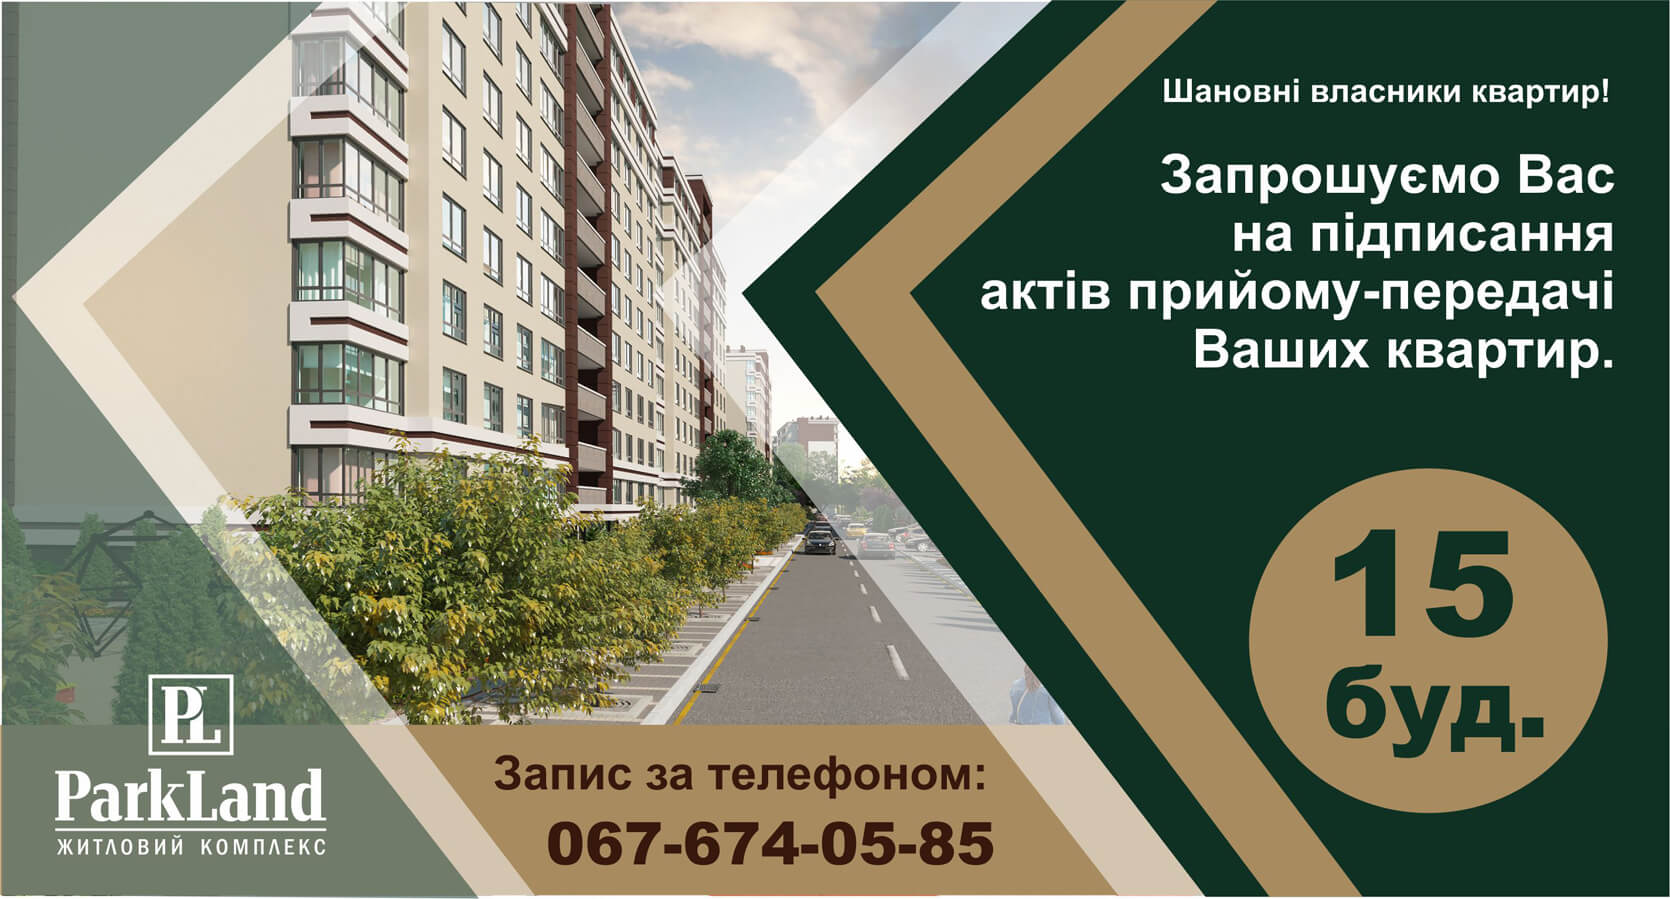 news-221018-1park-land-ukr